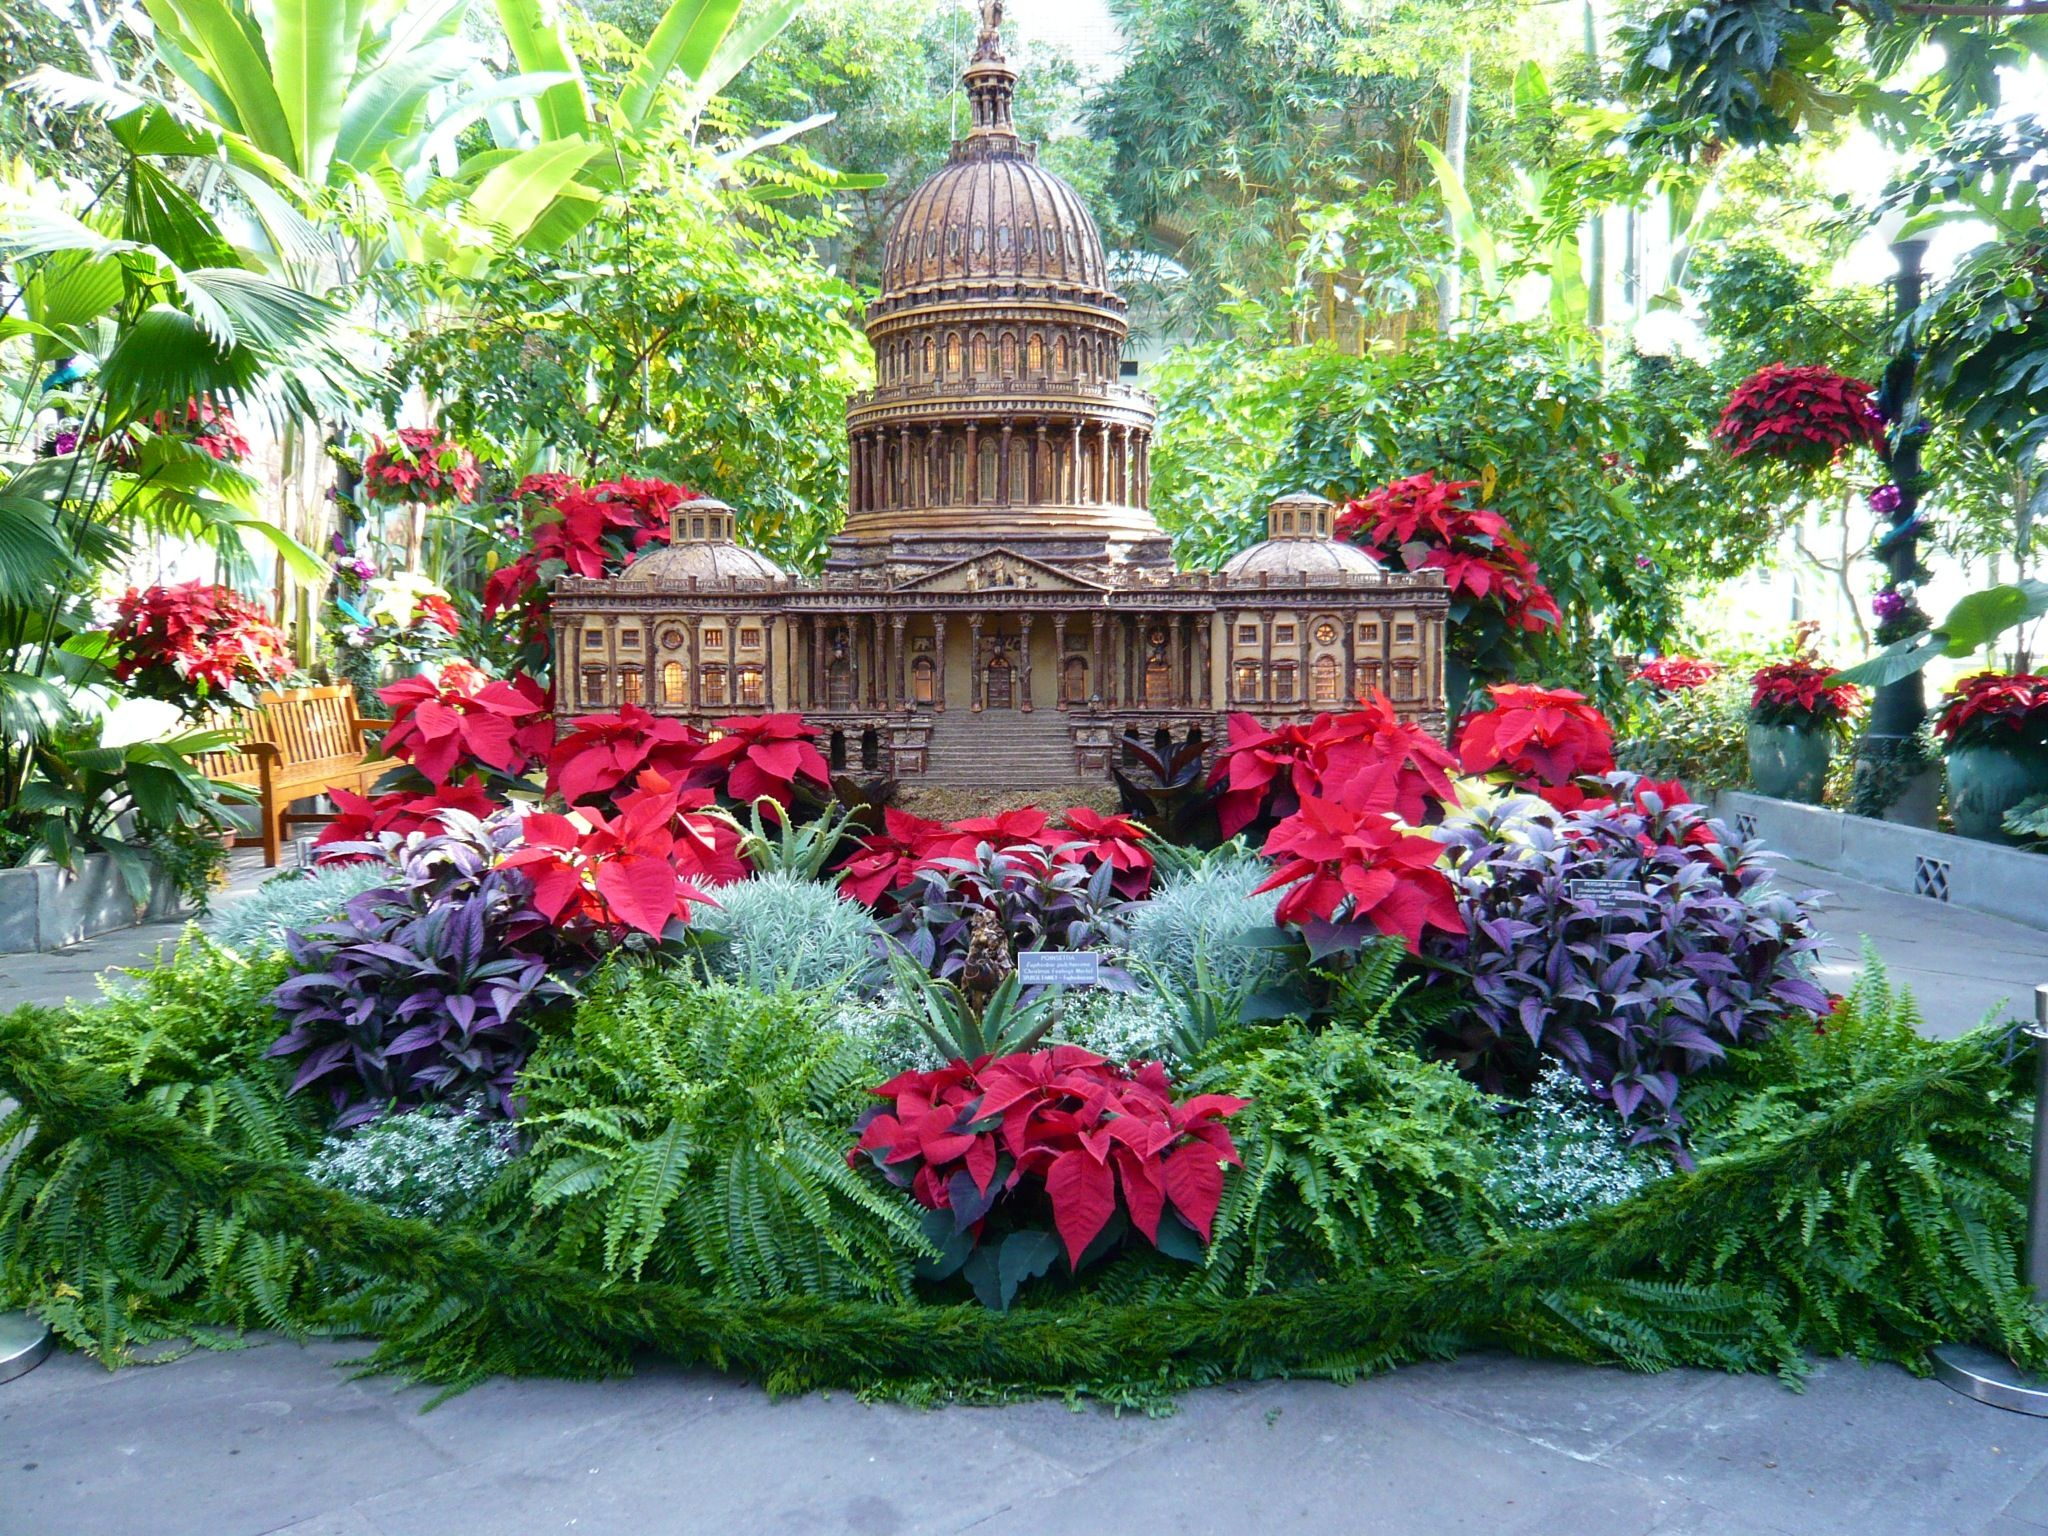 Botanical gardens dc fasci garden for Botanical gardens dc christmas